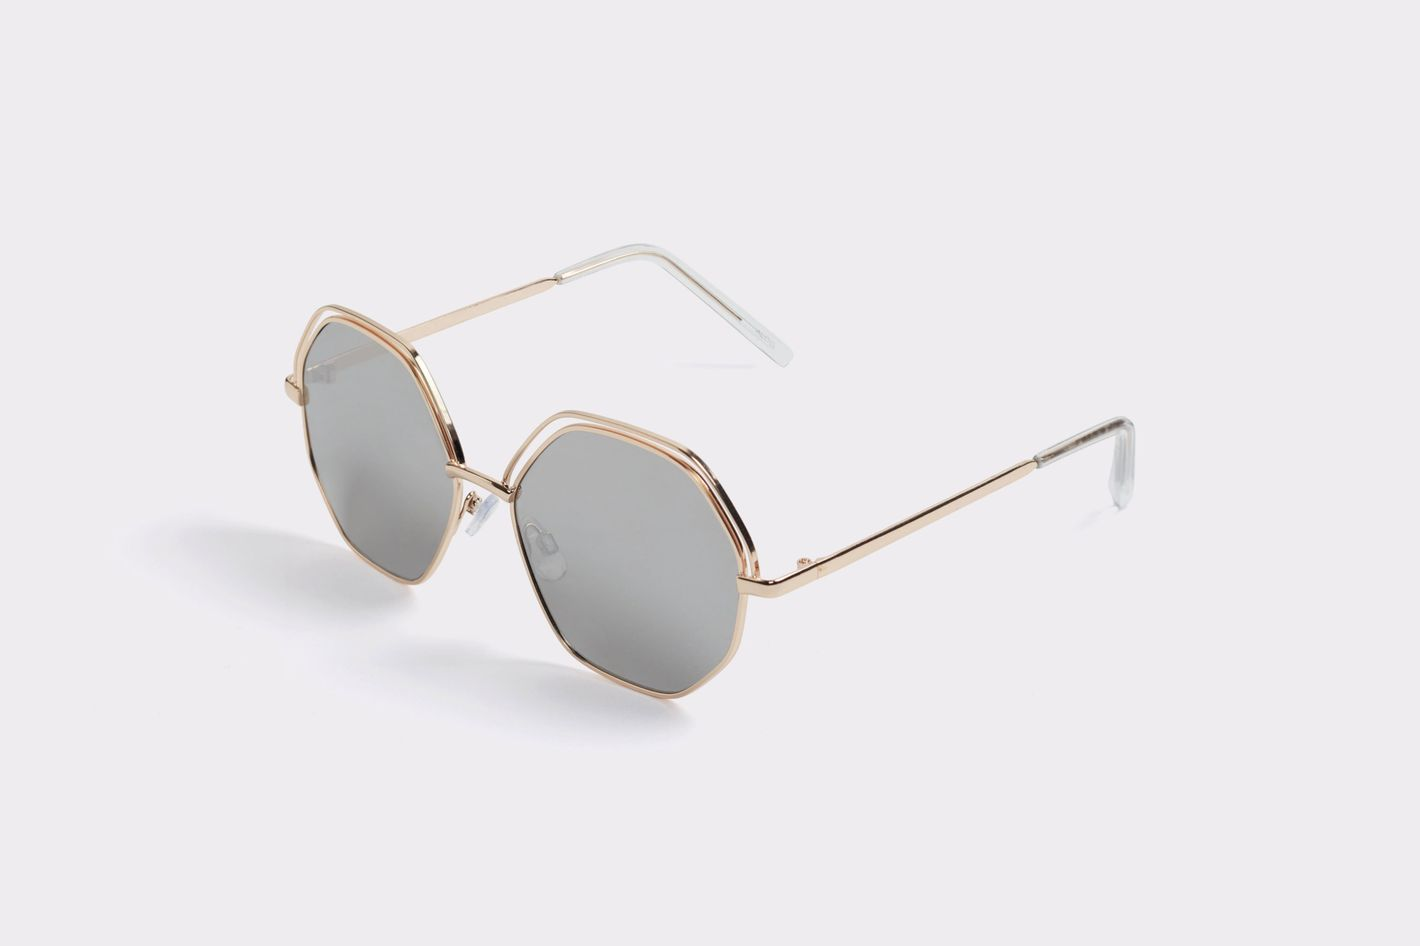 Aldo Cossani Sunglasses